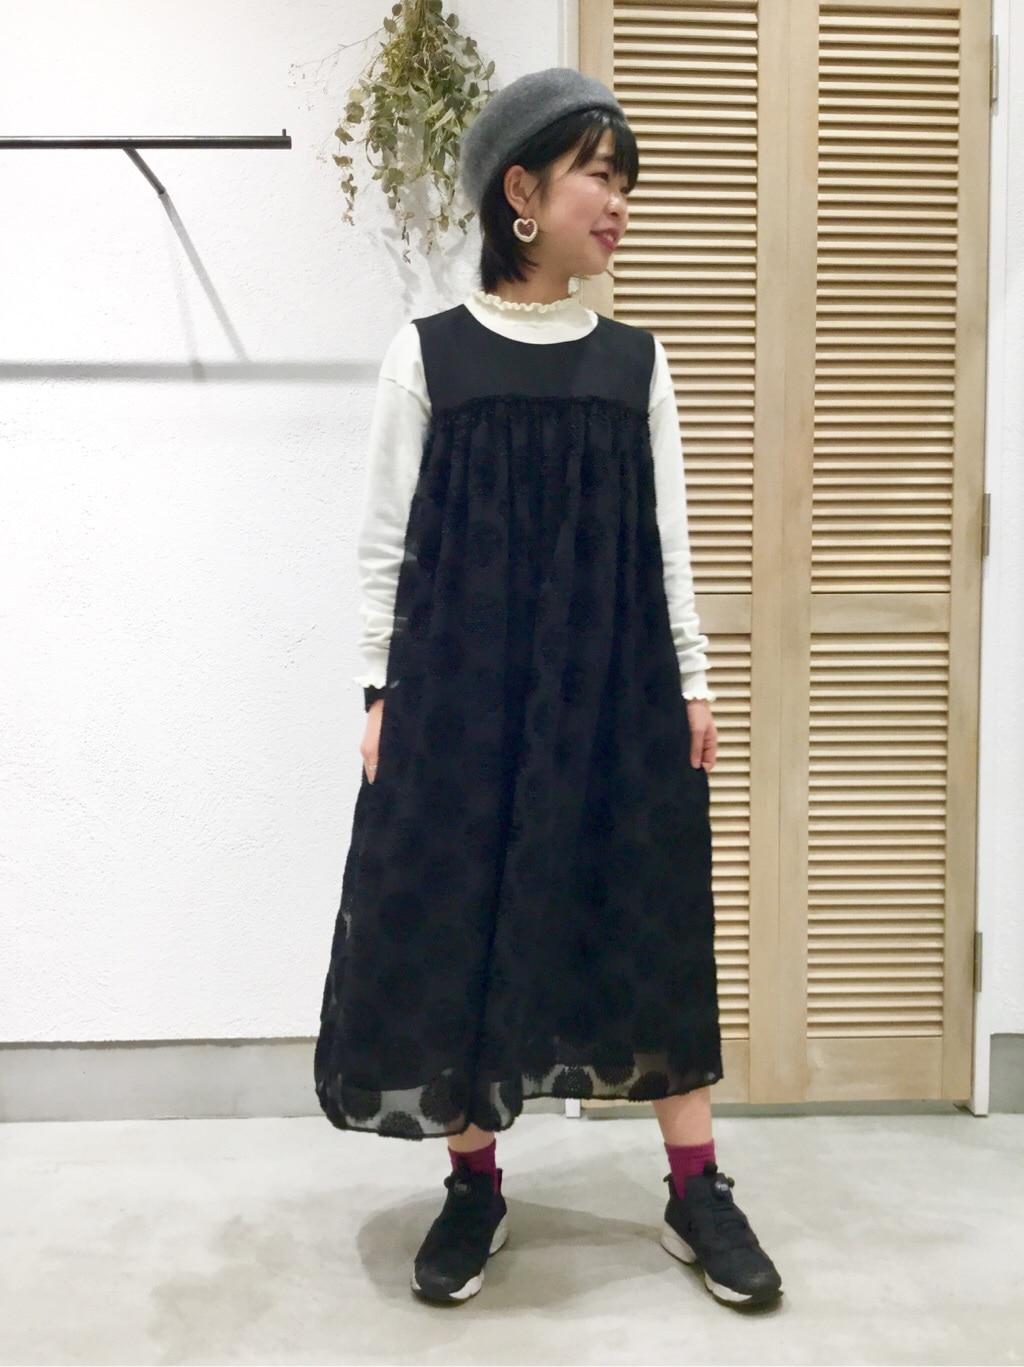 chambre de charme 横浜ジョイナス 身長:153cm 2019.12.14